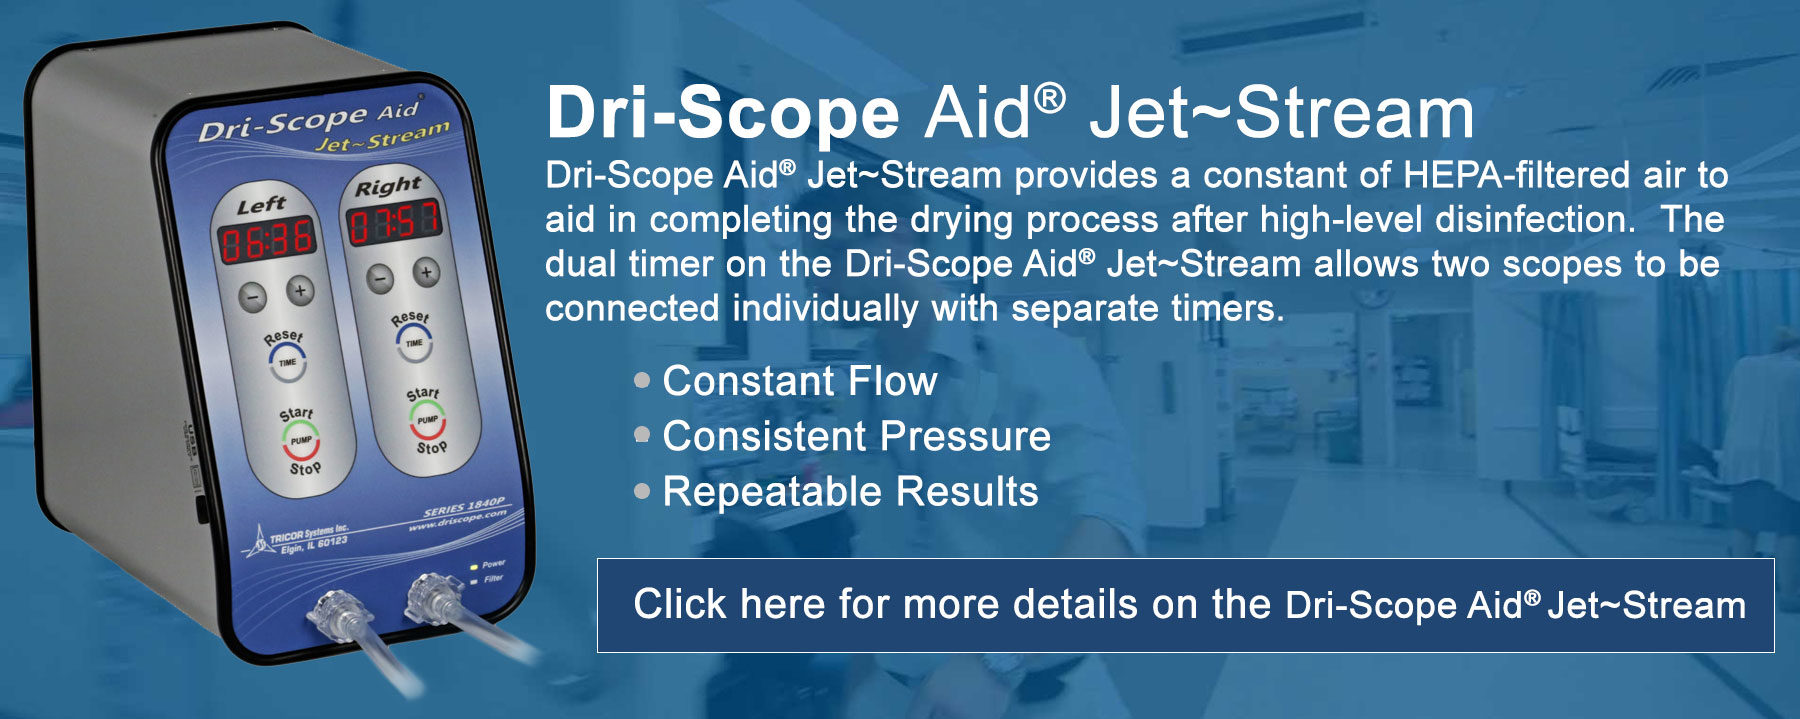 DriScope Aid Jet~Stream